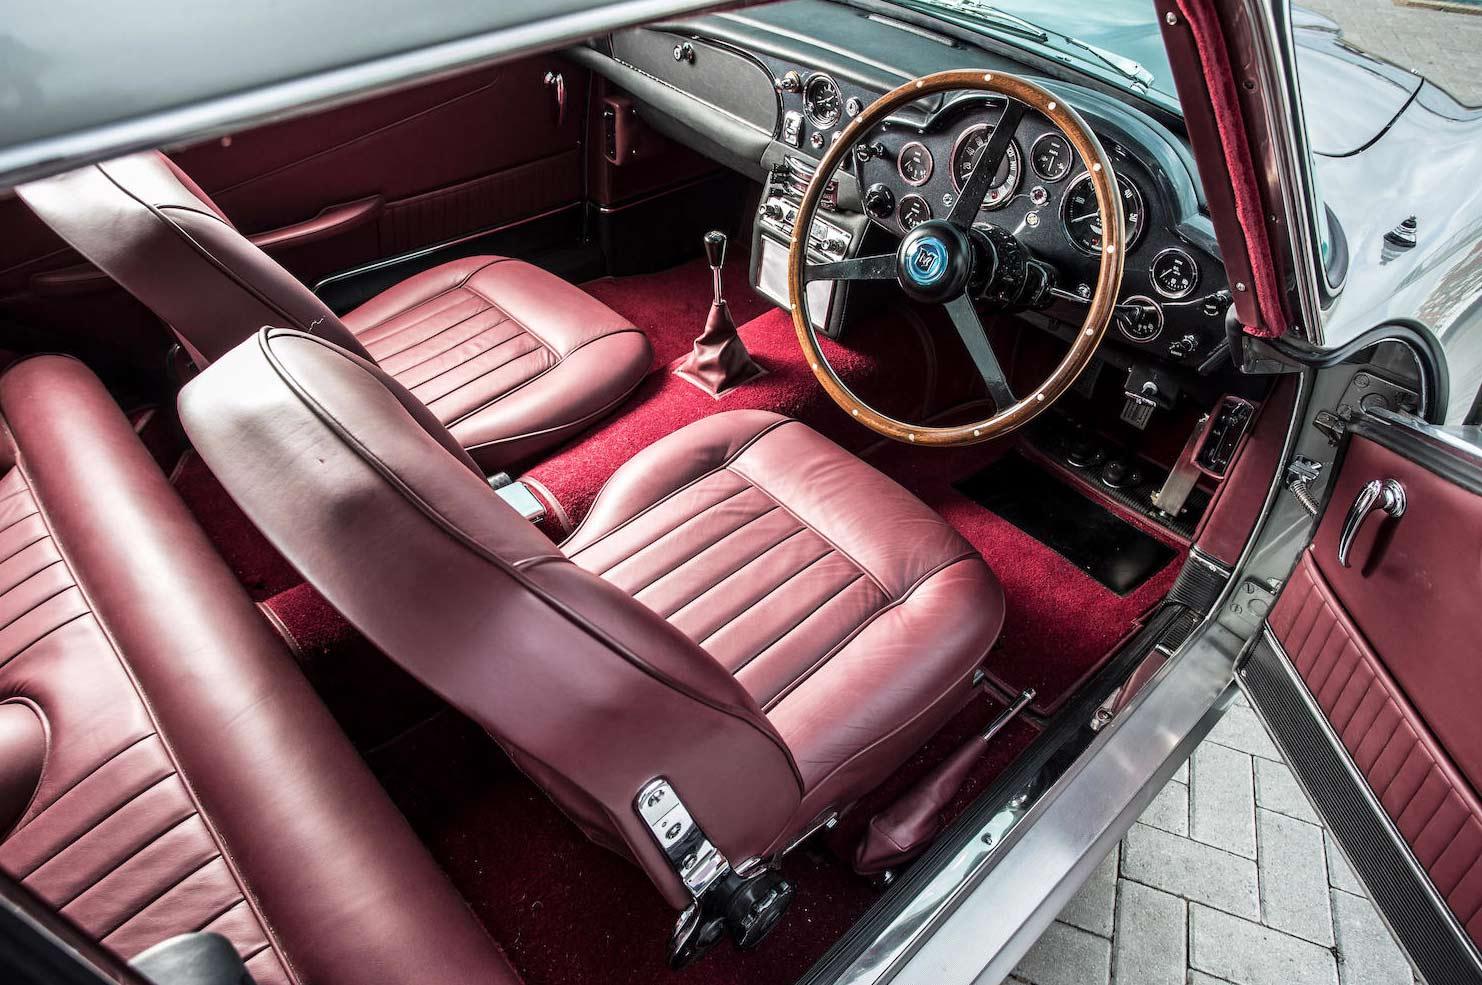 Paul-Mccartner-Aston-Martin-DB5-4